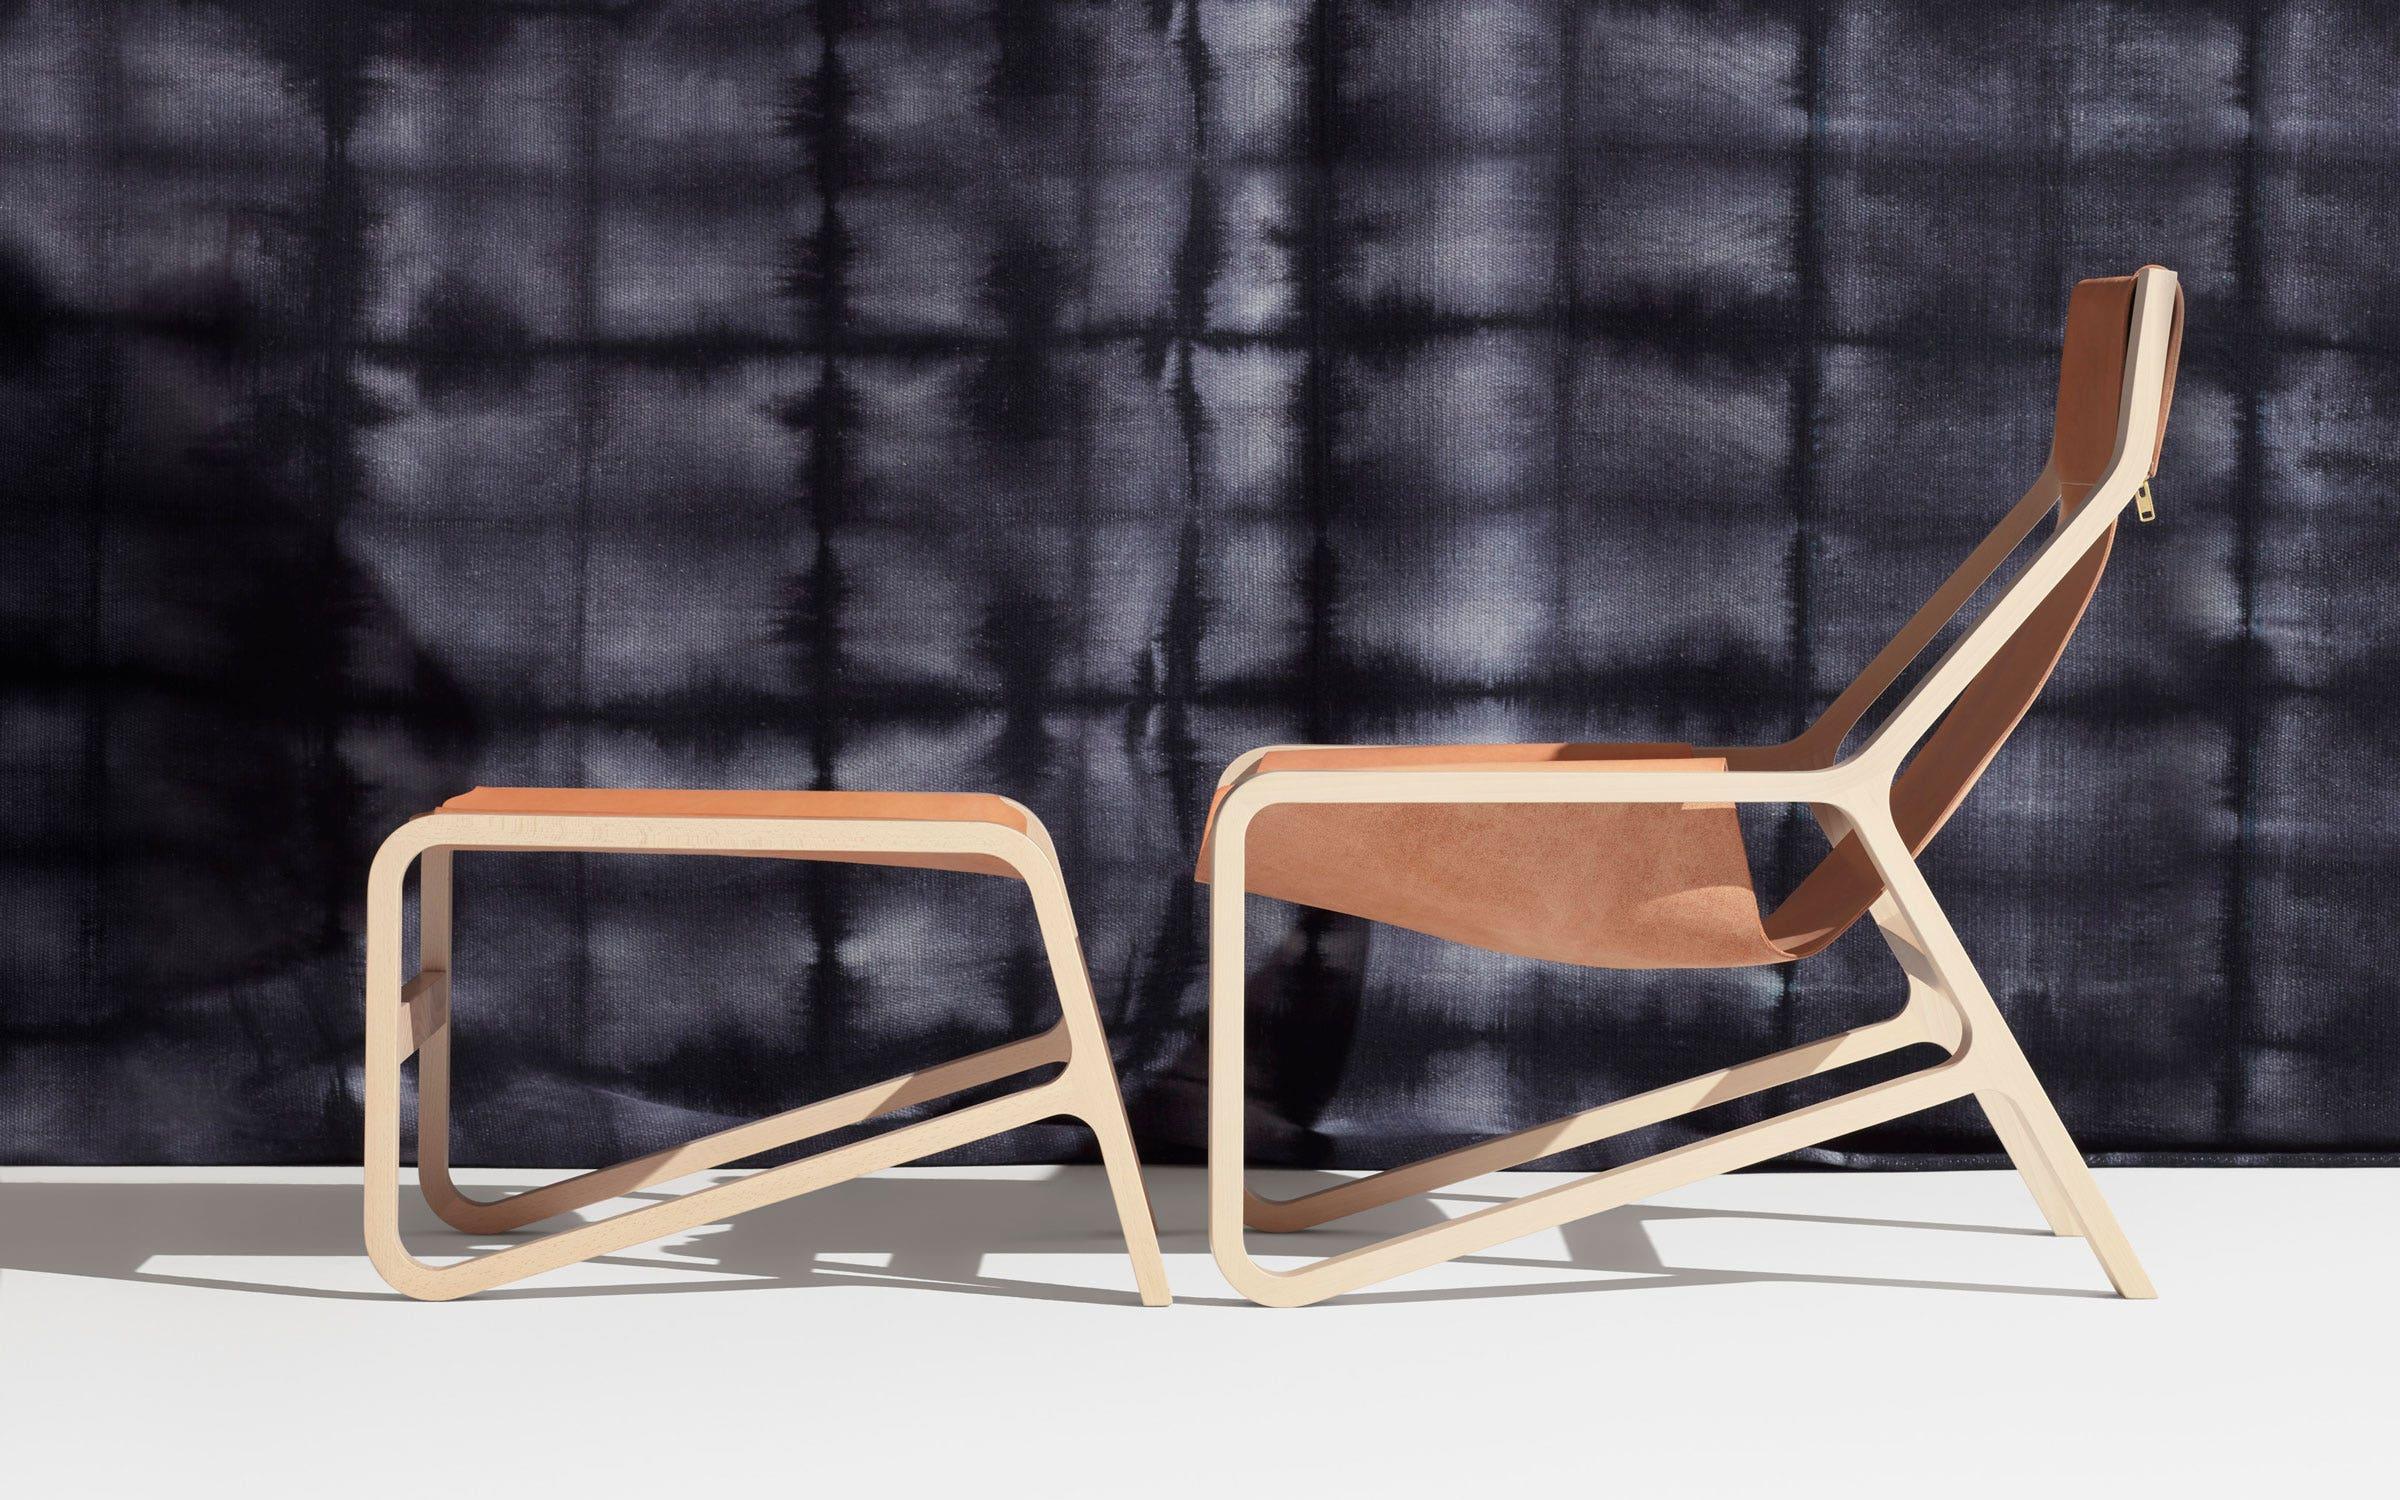 Tremendous Toro Sling Ottoman Leather Sling Ottoman Blu Dot Spiritservingveterans Wood Chair Design Ideas Spiritservingveteransorg